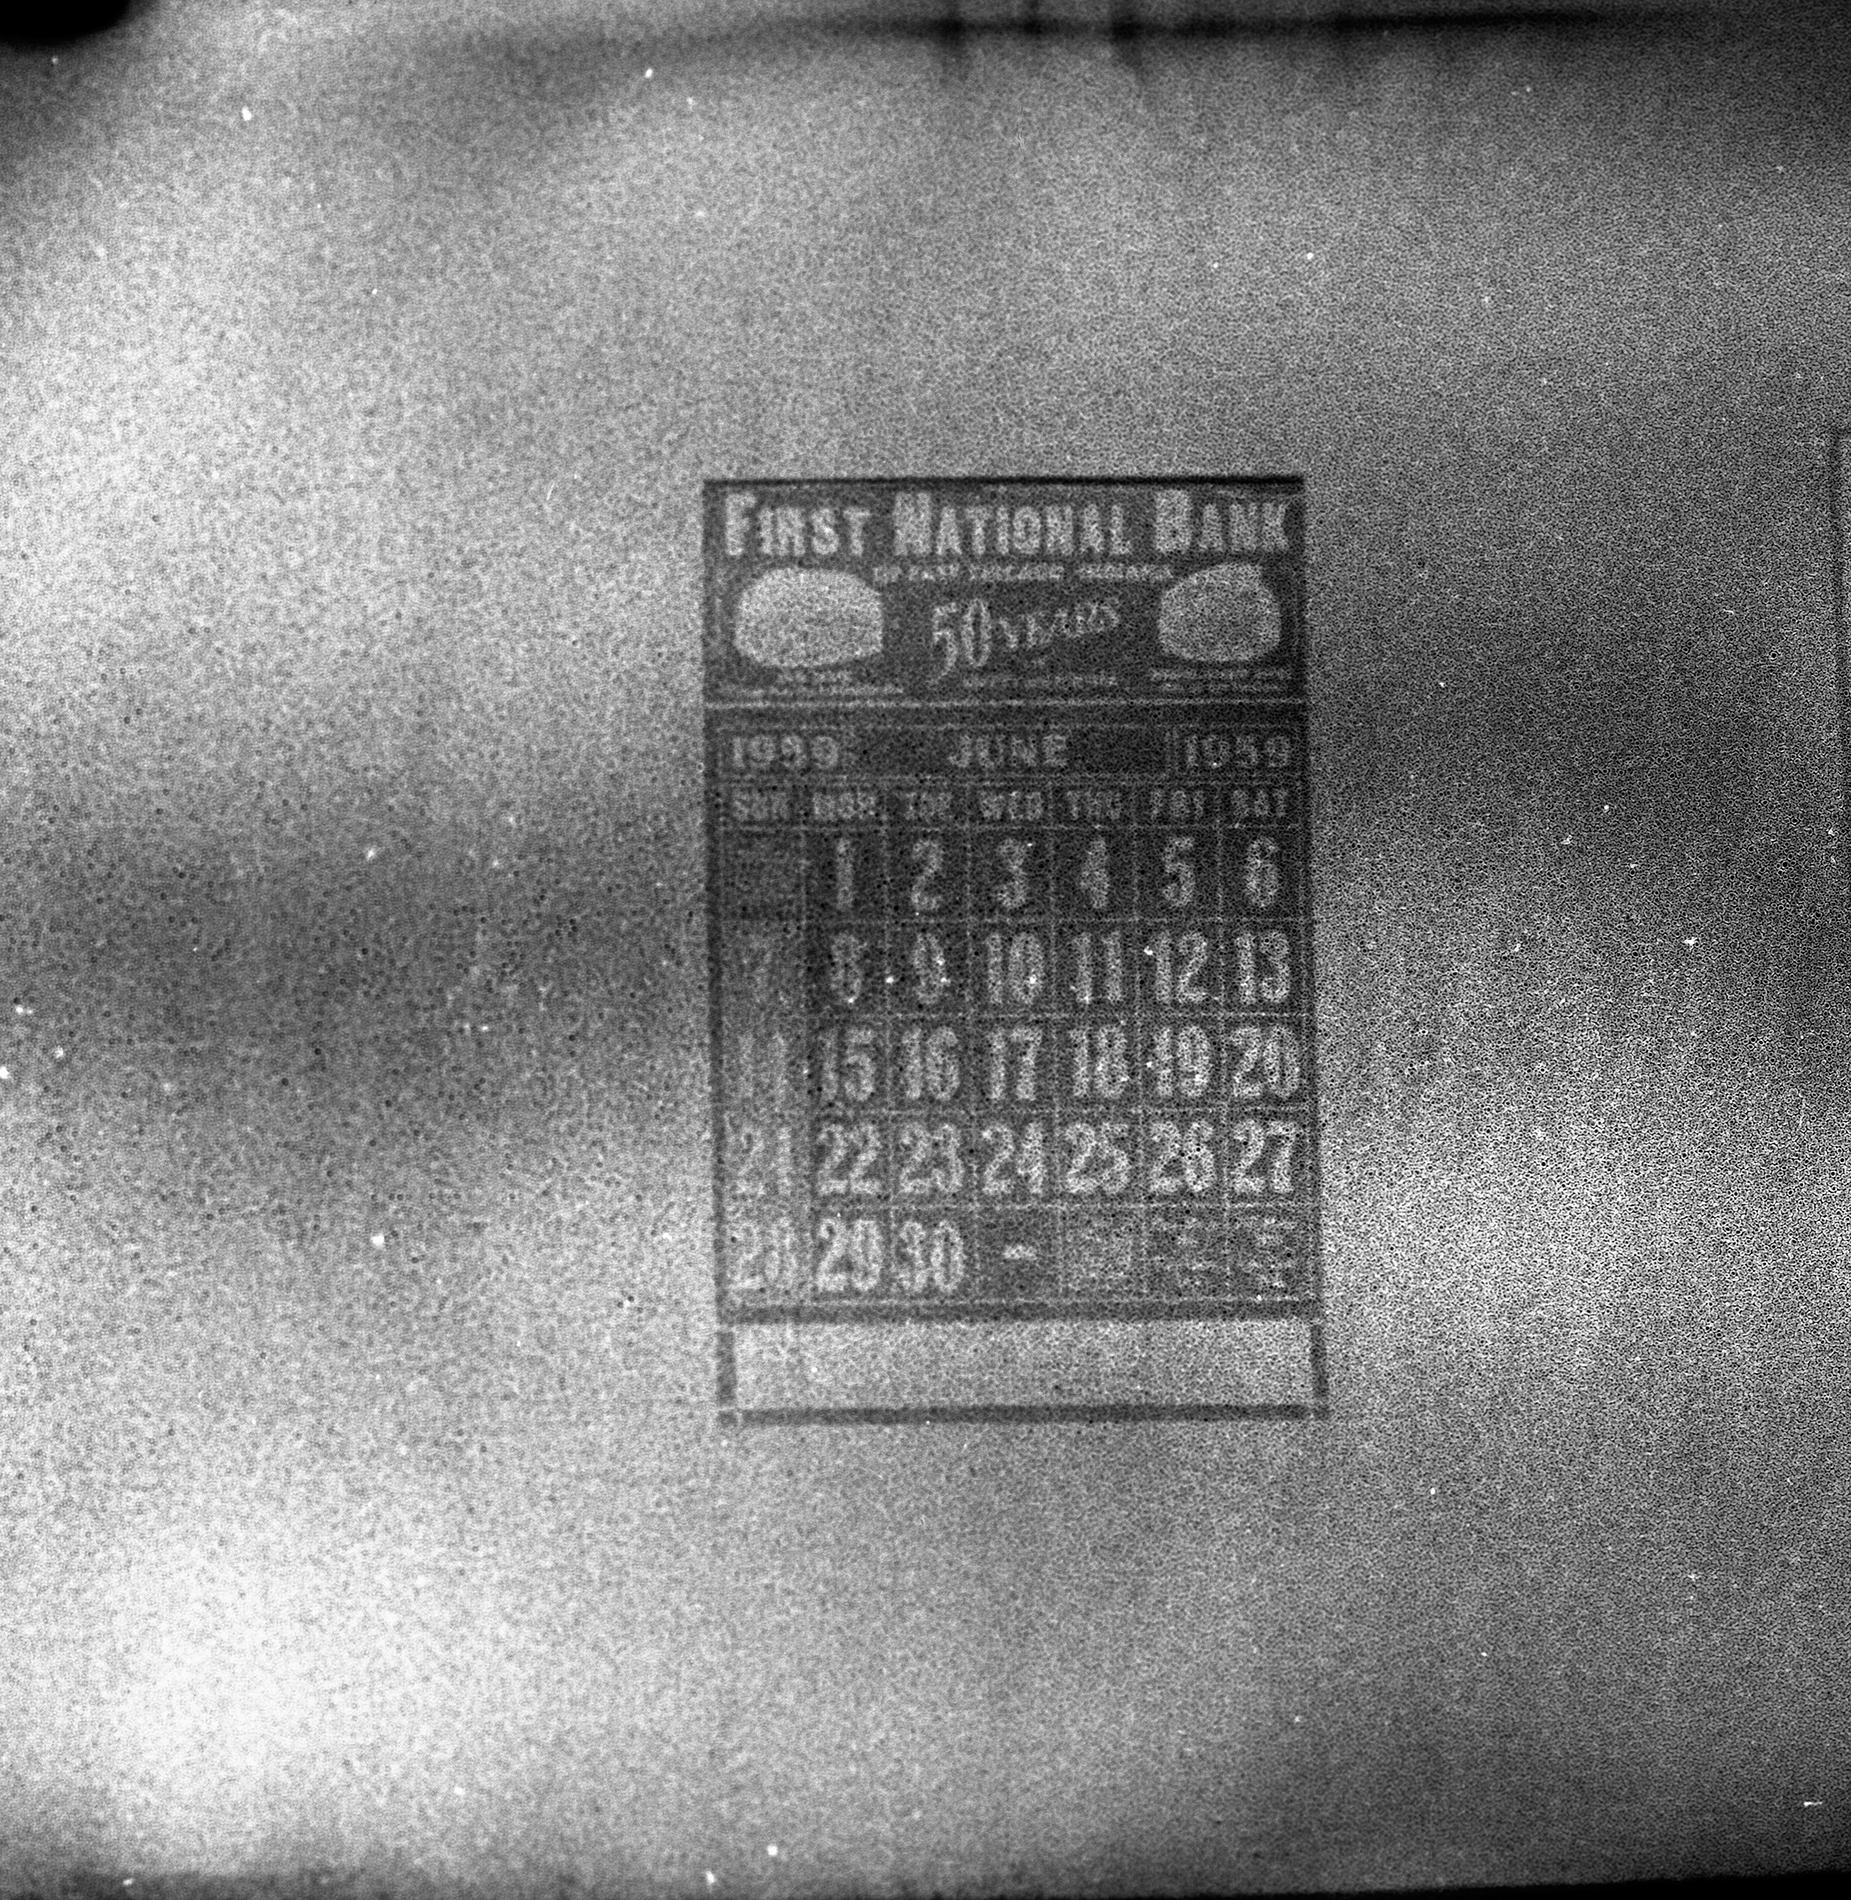 Paul Bundle 41 Roll 2 009.jpg